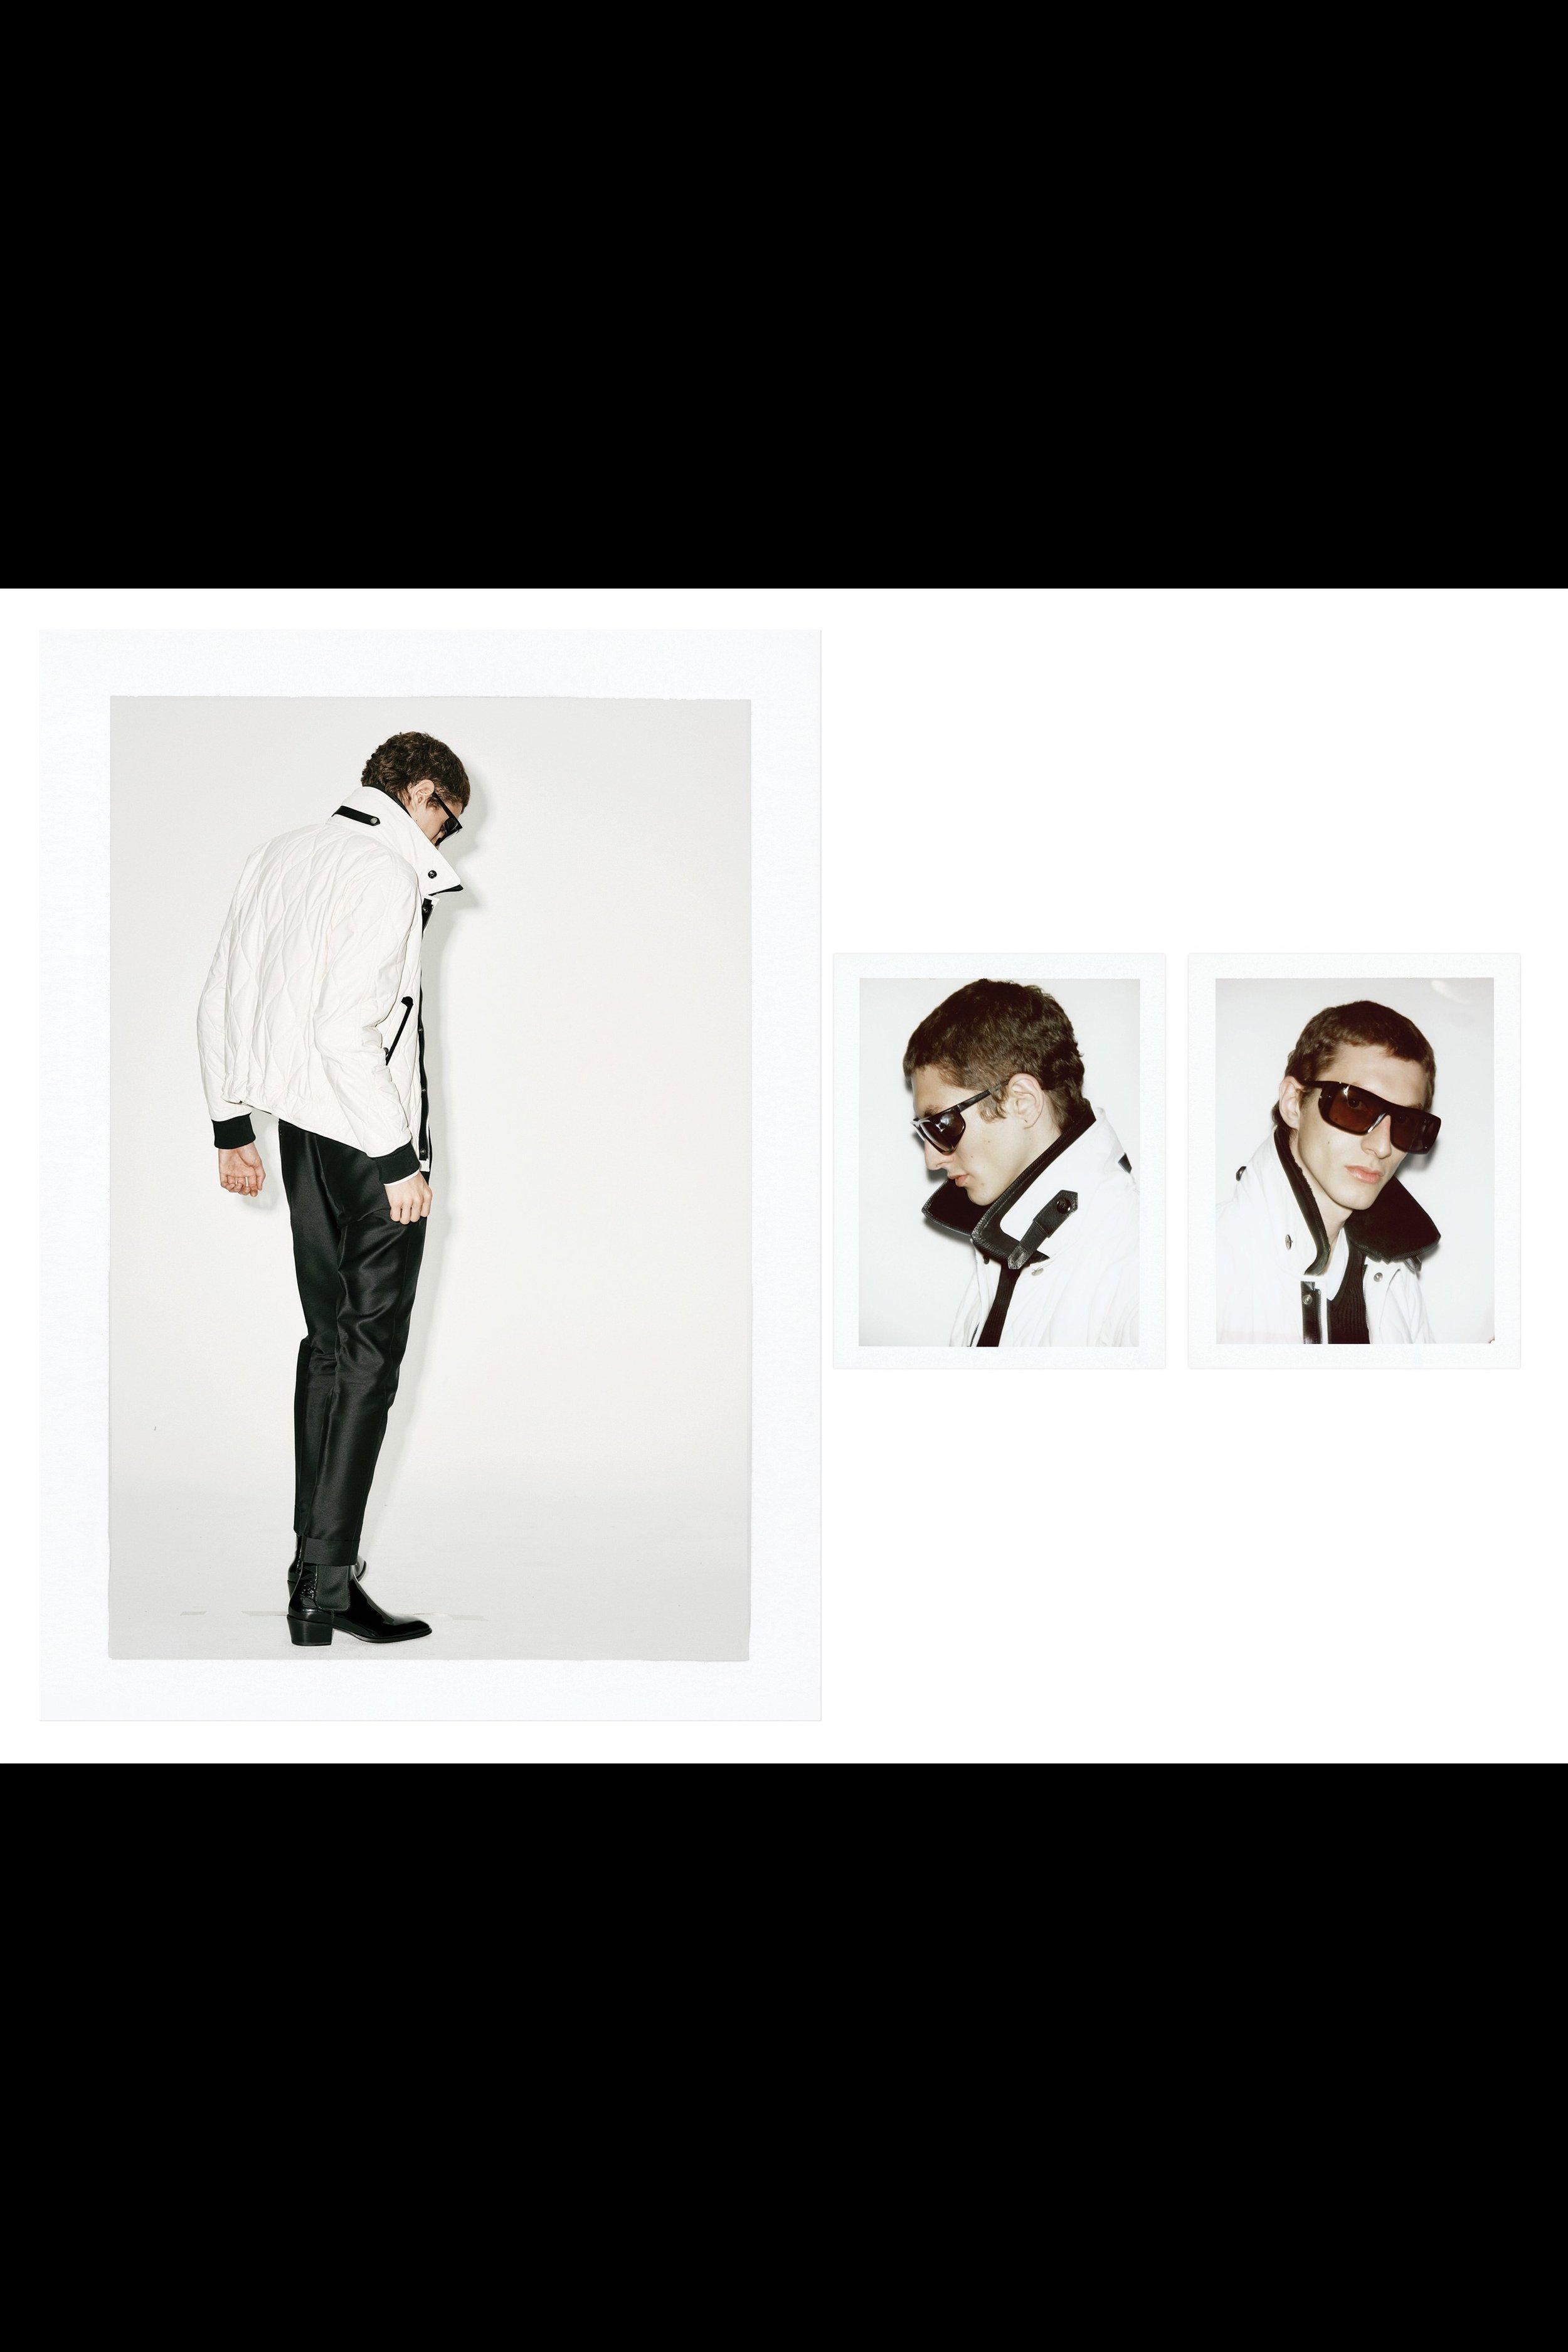 00010-Tom-Ford-vogue-menswear-spring-2019-pr.jpg